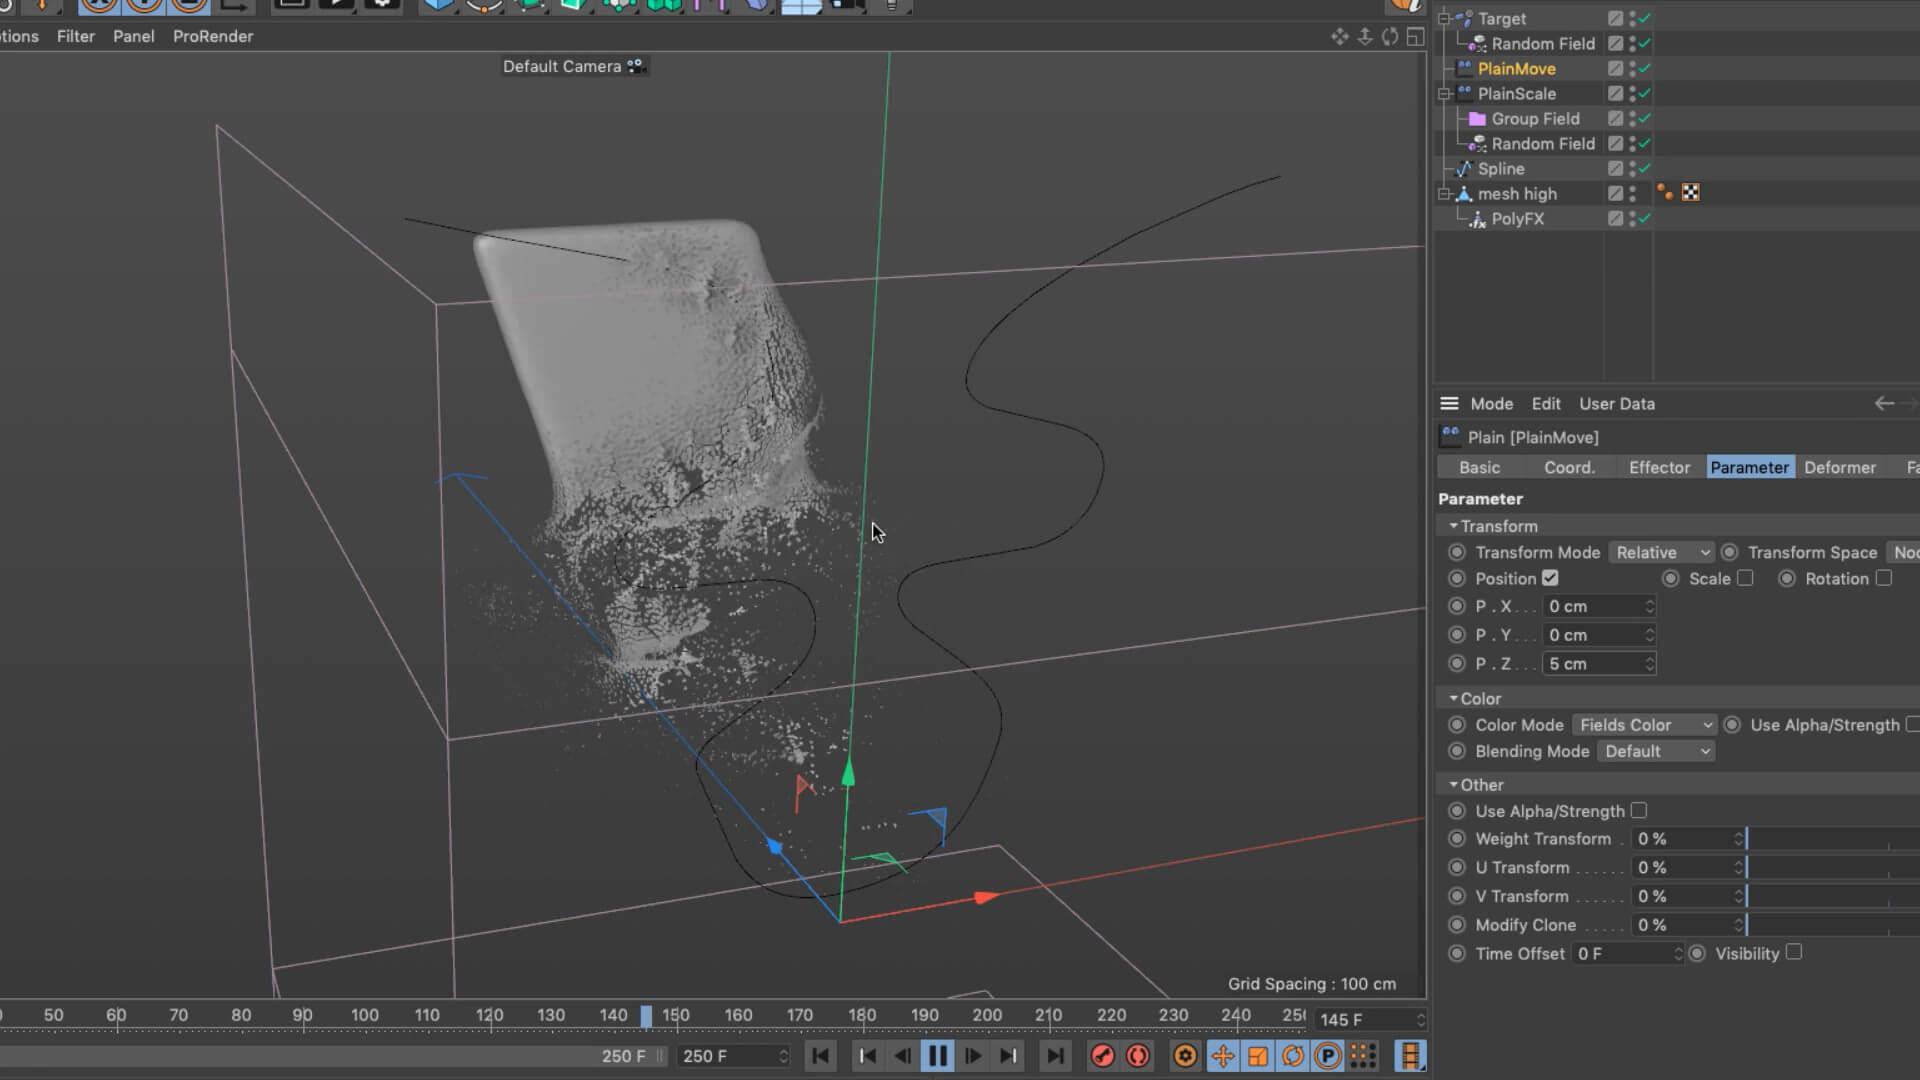 C4D 使用PolyFX和MoGraph工具设置溶解教程designshidai_C4D06